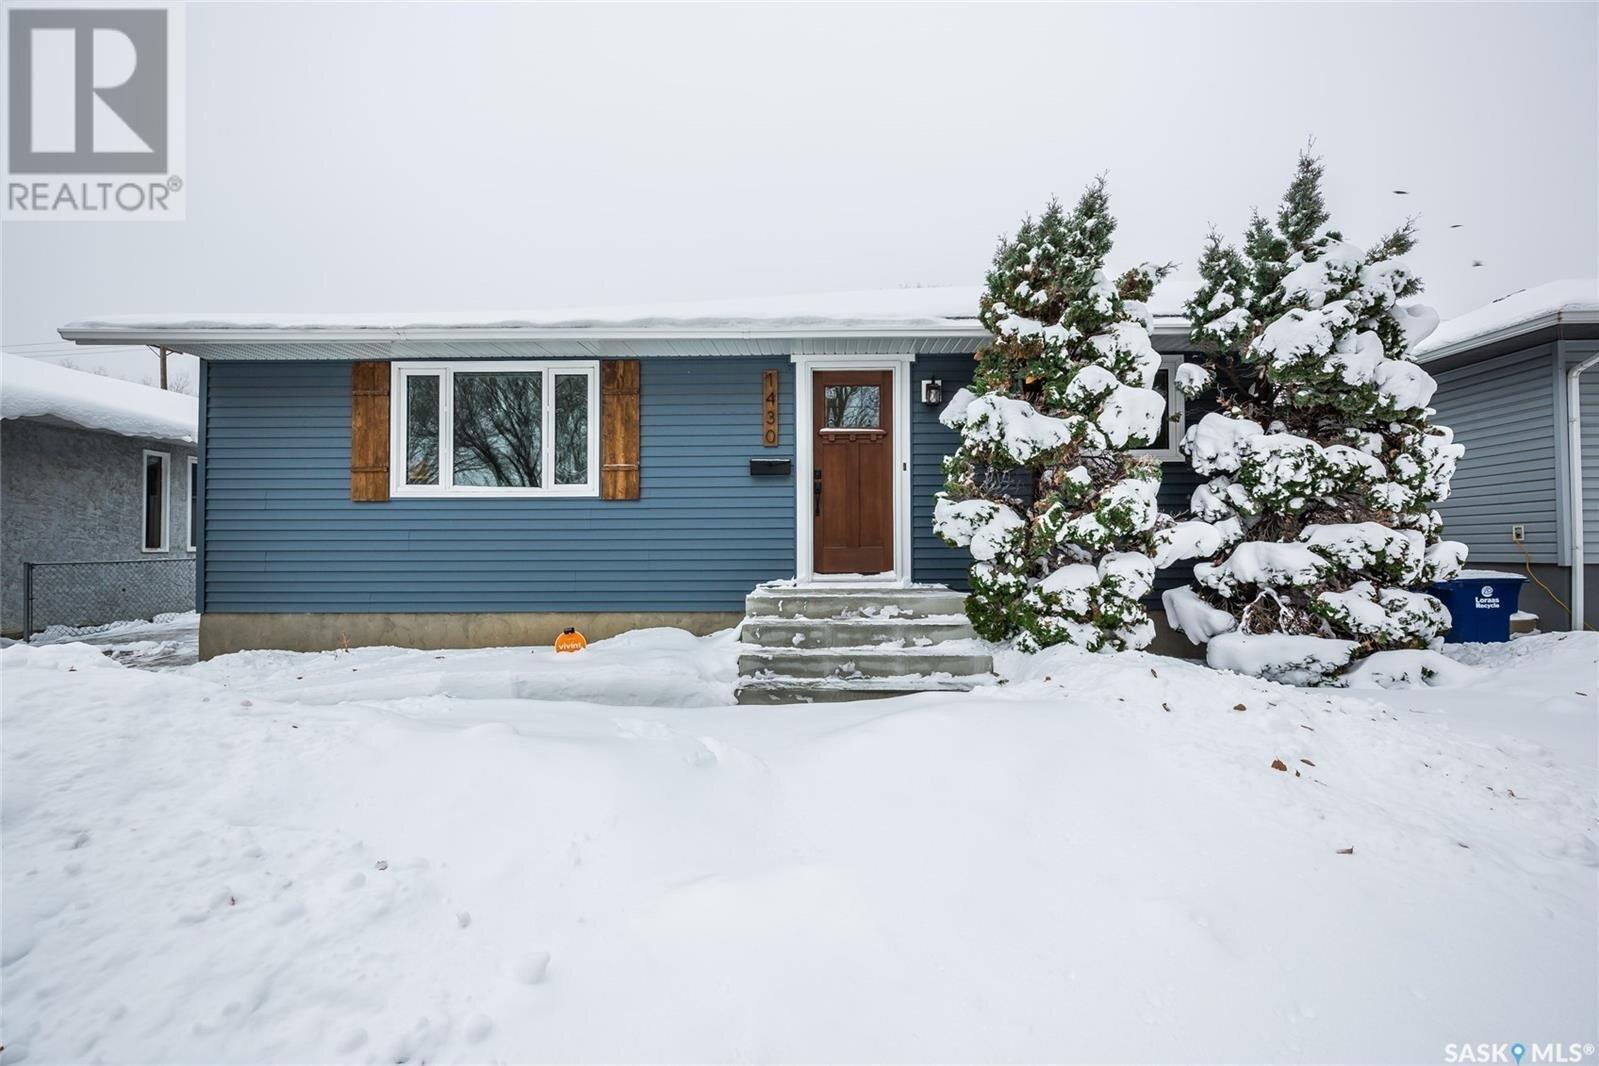 House for sale at 1430 I Ave N Saskatoon Saskatchewan - MLS: SK833895